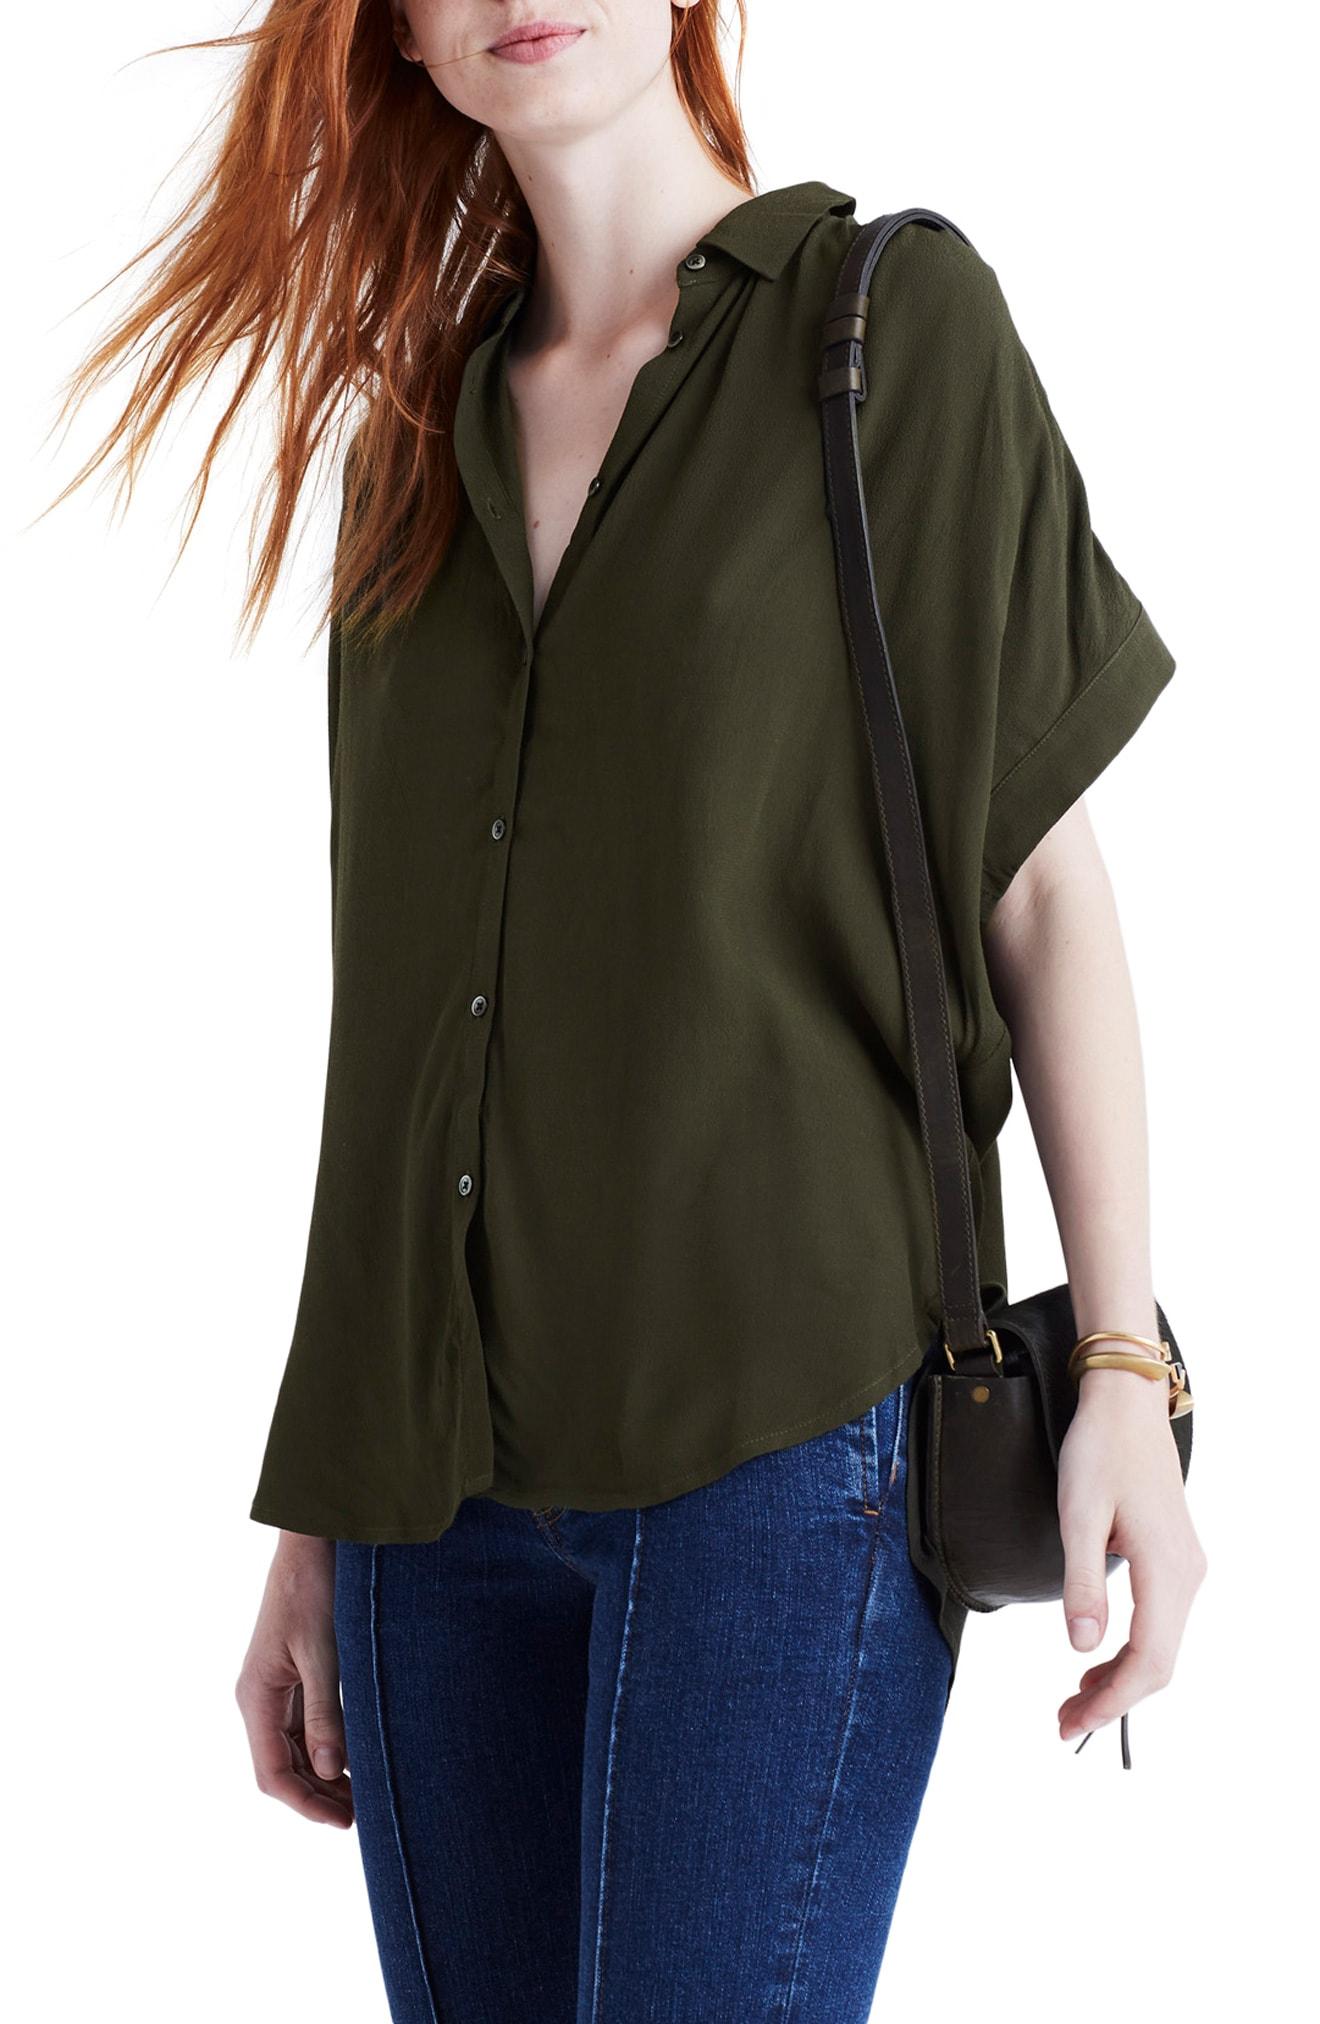 Madewell Central Drapey Shirt (Regular & Plus Size)